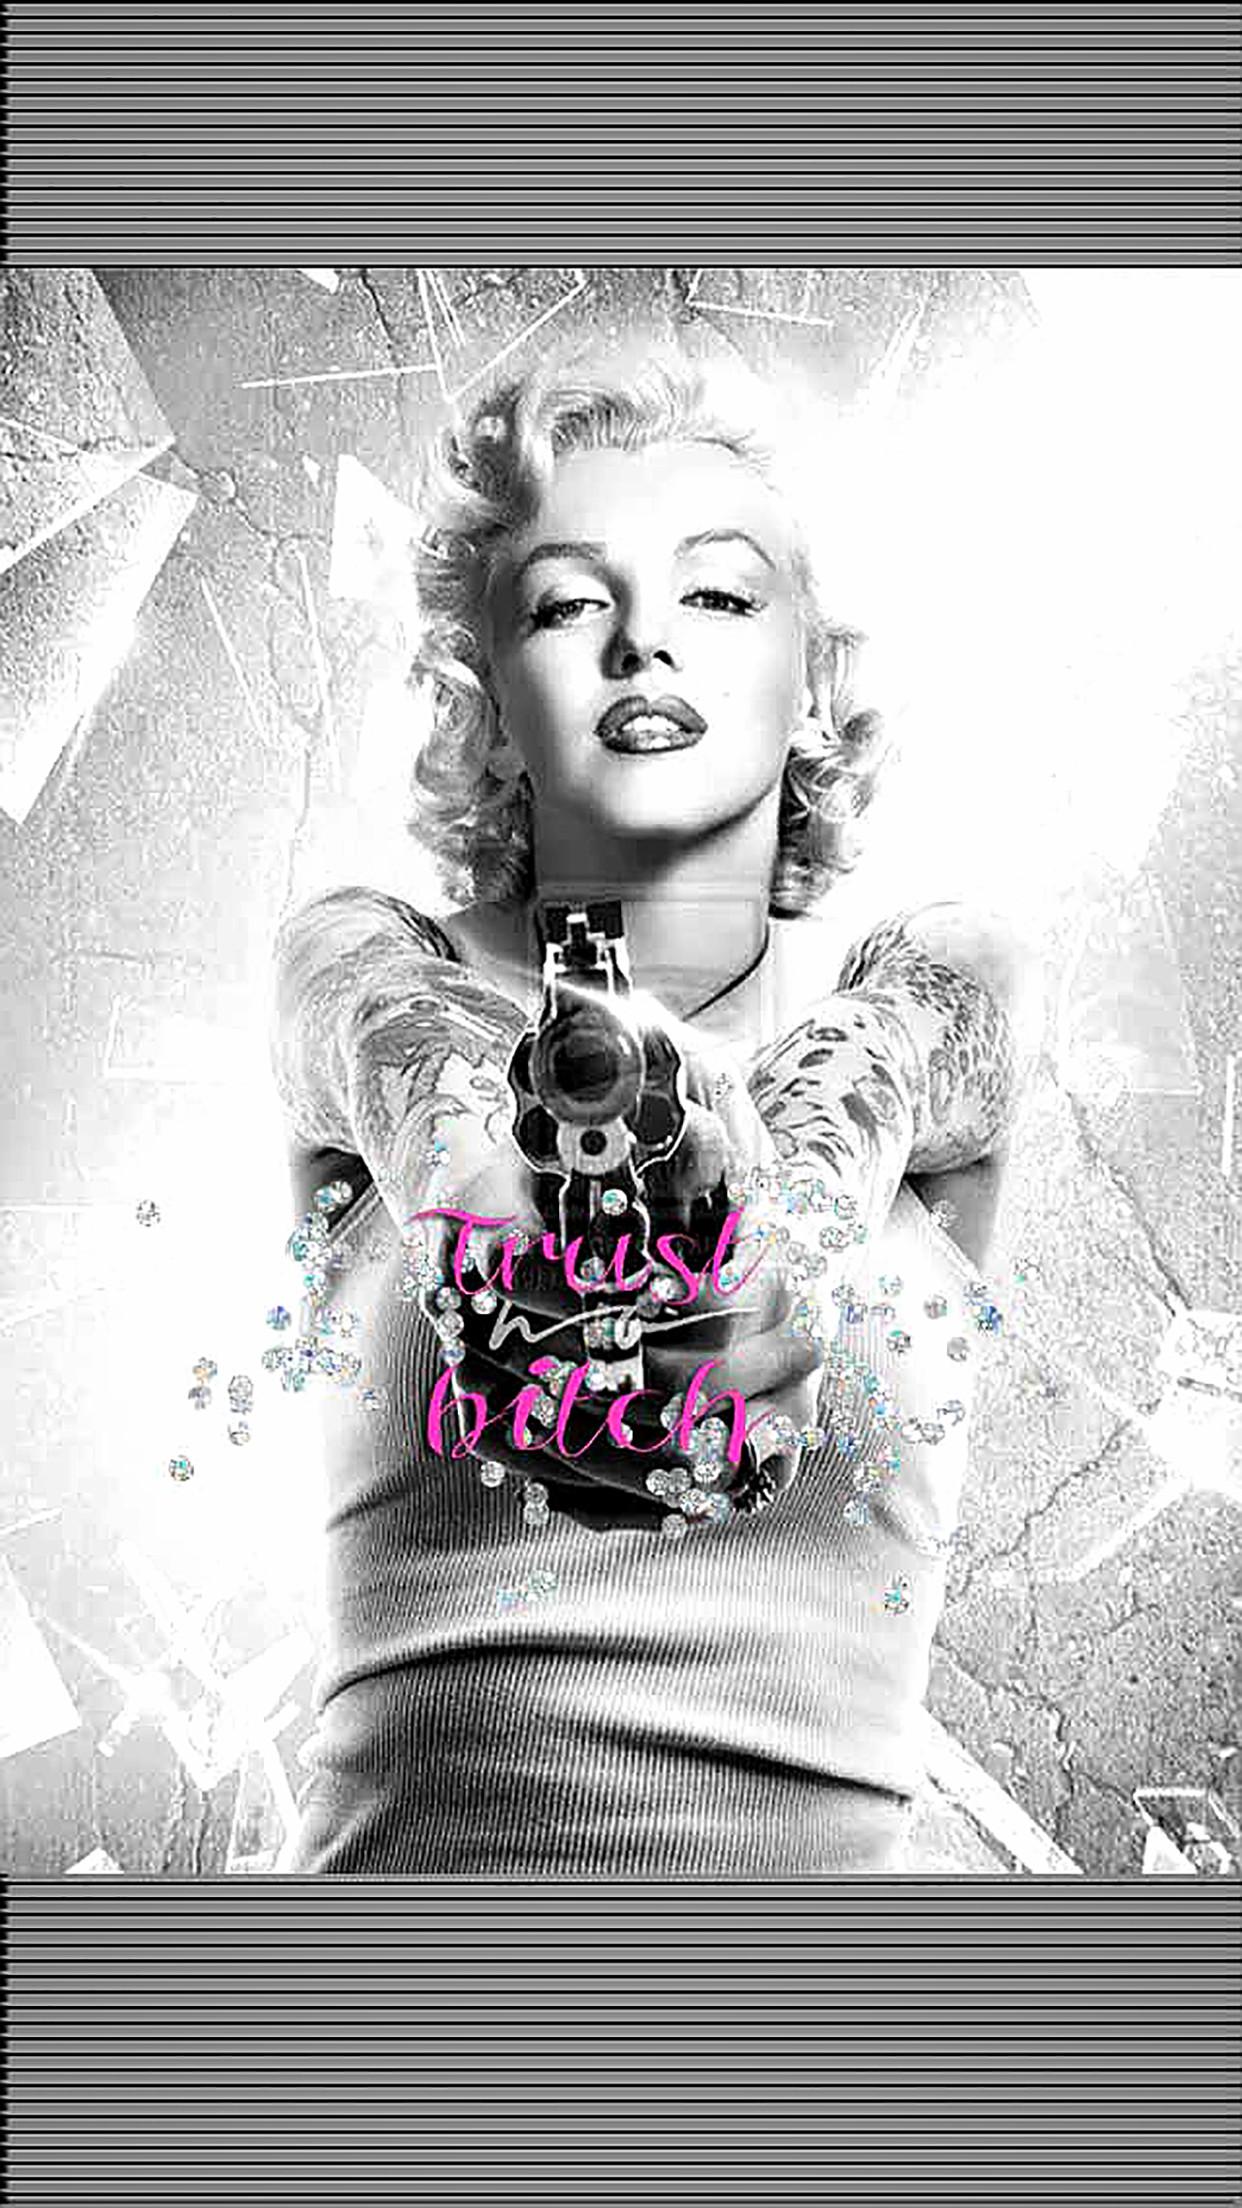 Tattooed Marilyn Monroe Wallpaper (63+ images)